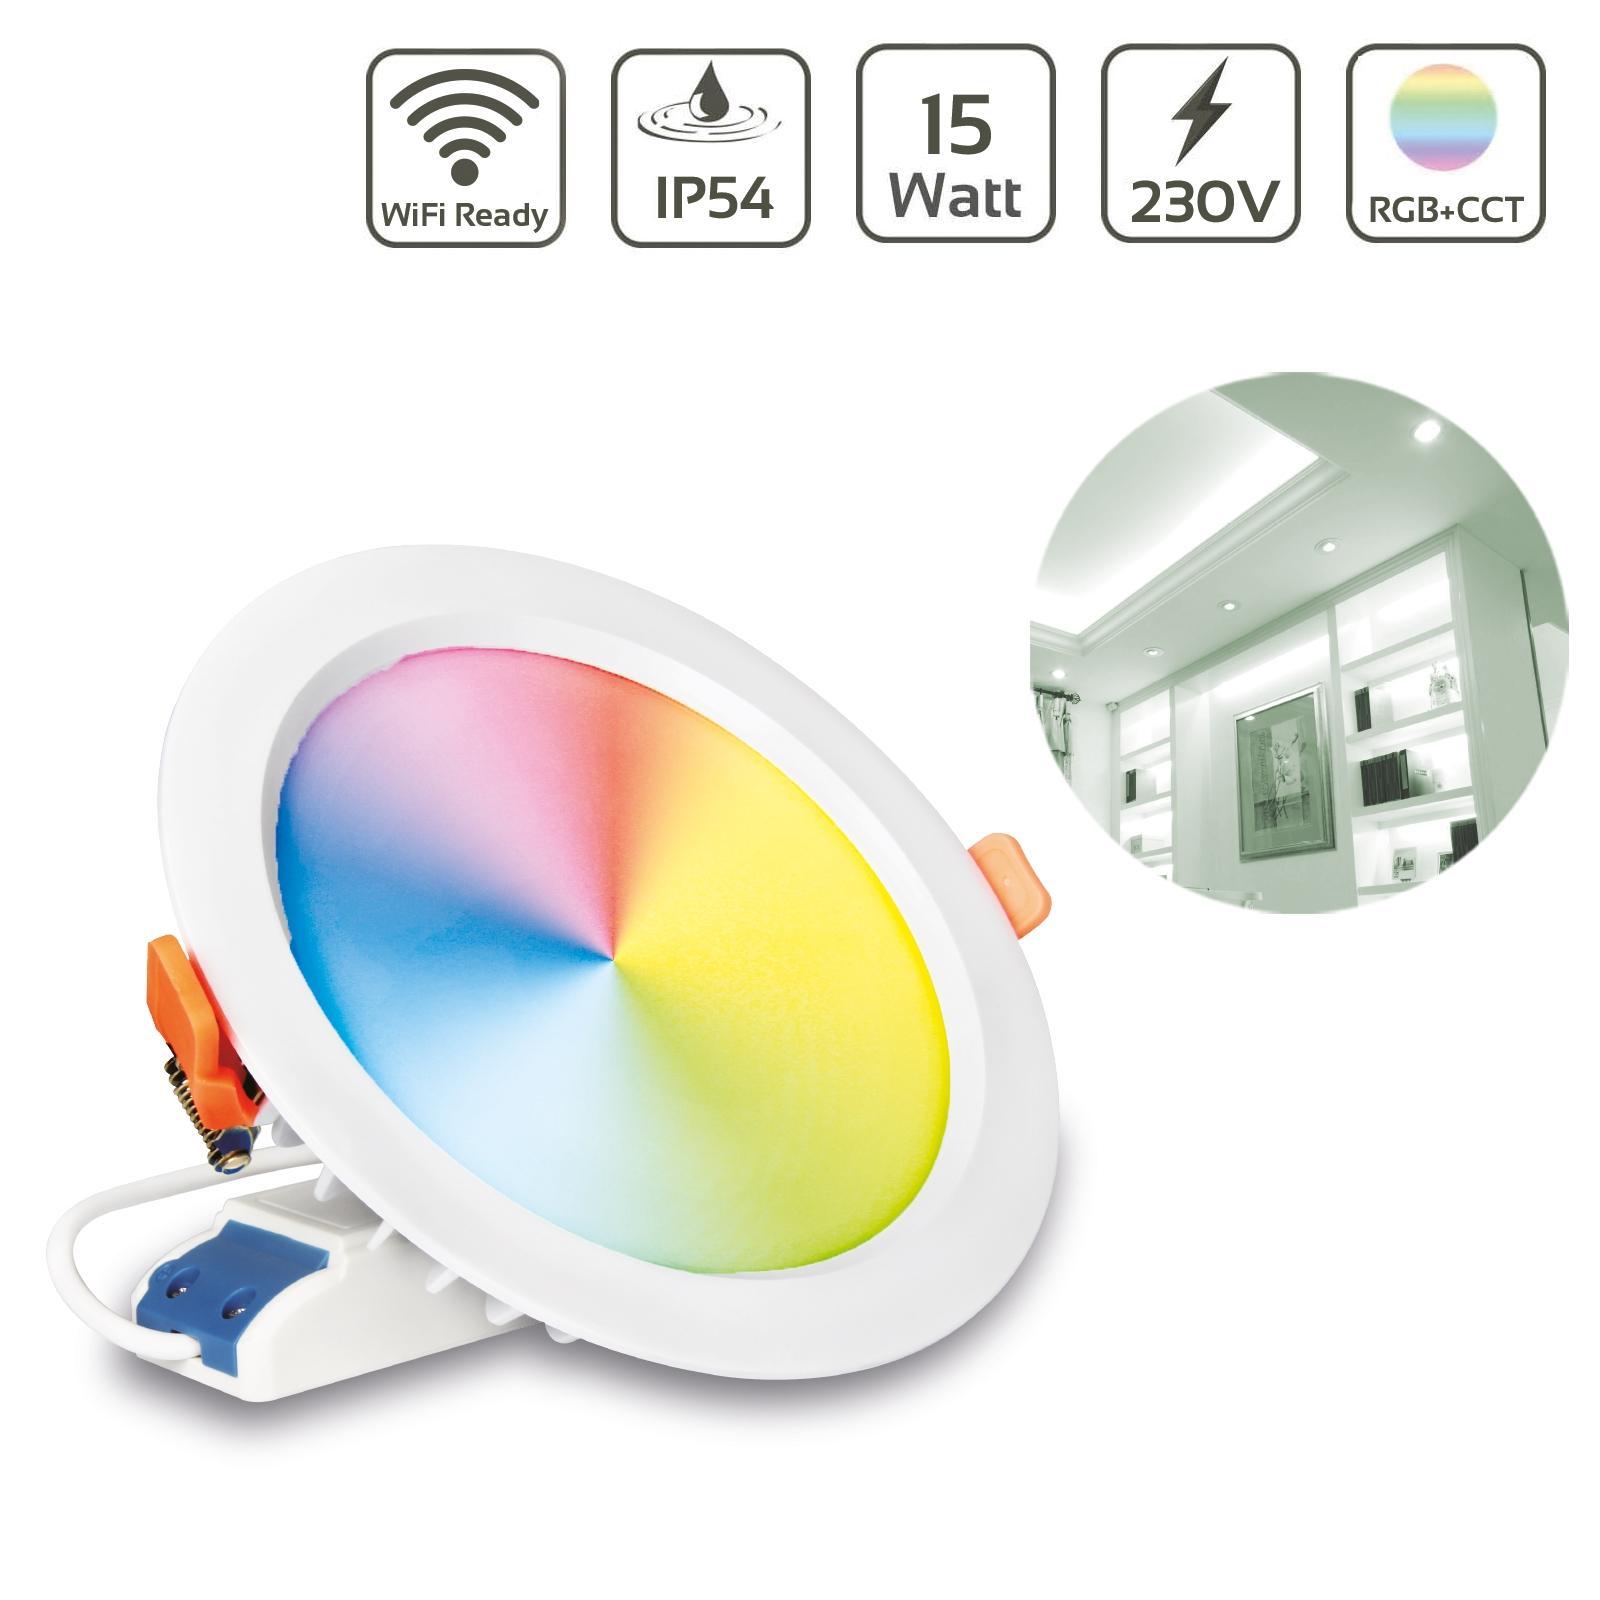 MiBoxer LED Einbaustrahler RGB+CCT 15W Ø190mm IP54 2,4GHz WiFiready